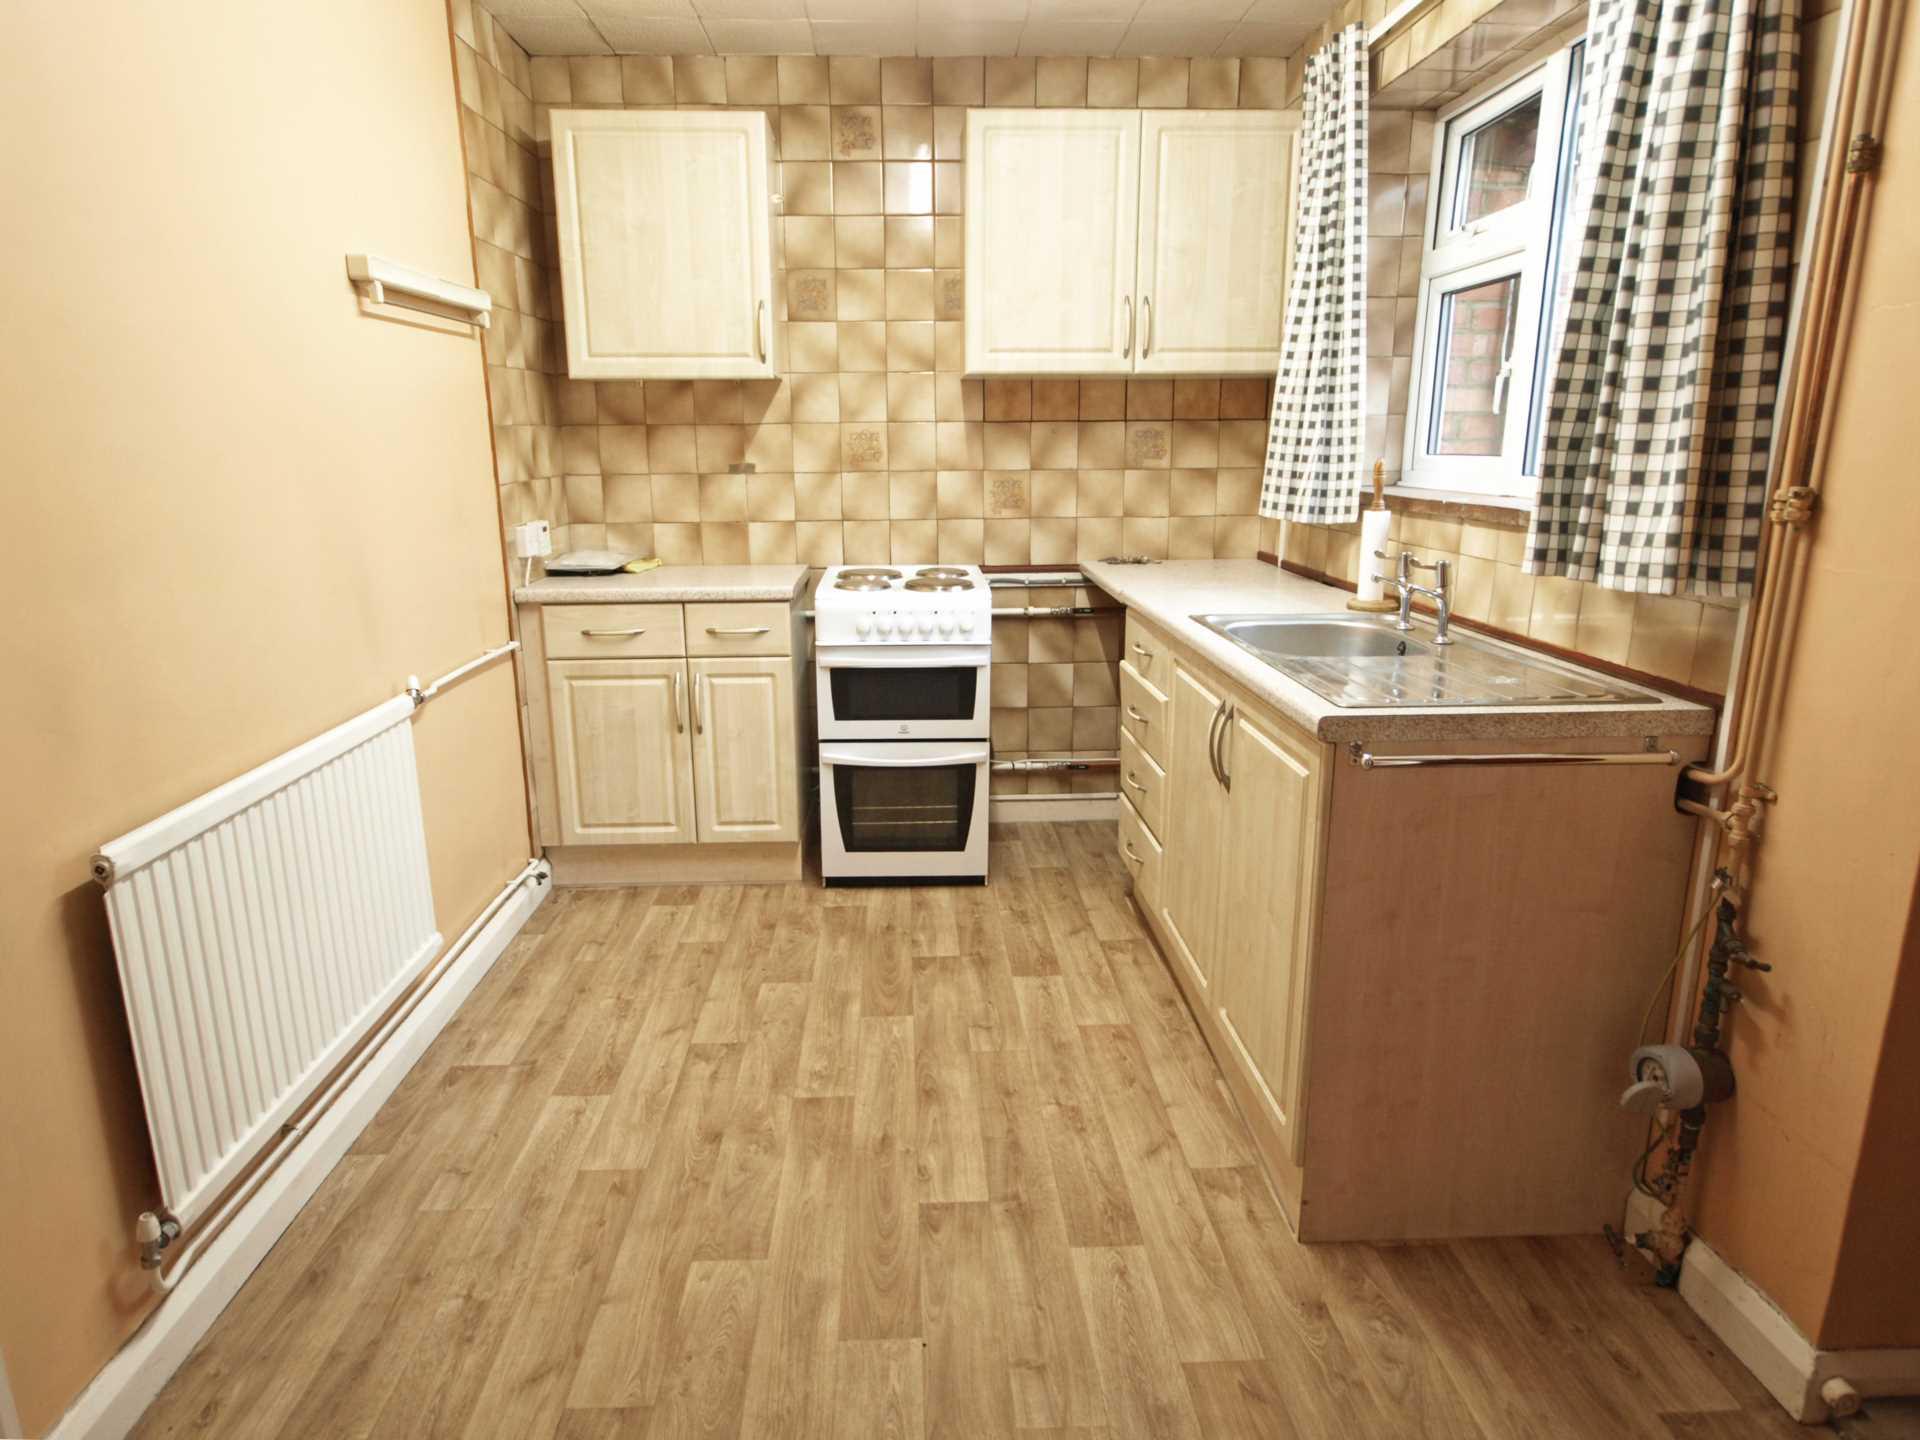 3 bedroom bungalow for sale sport villa bicester road launton